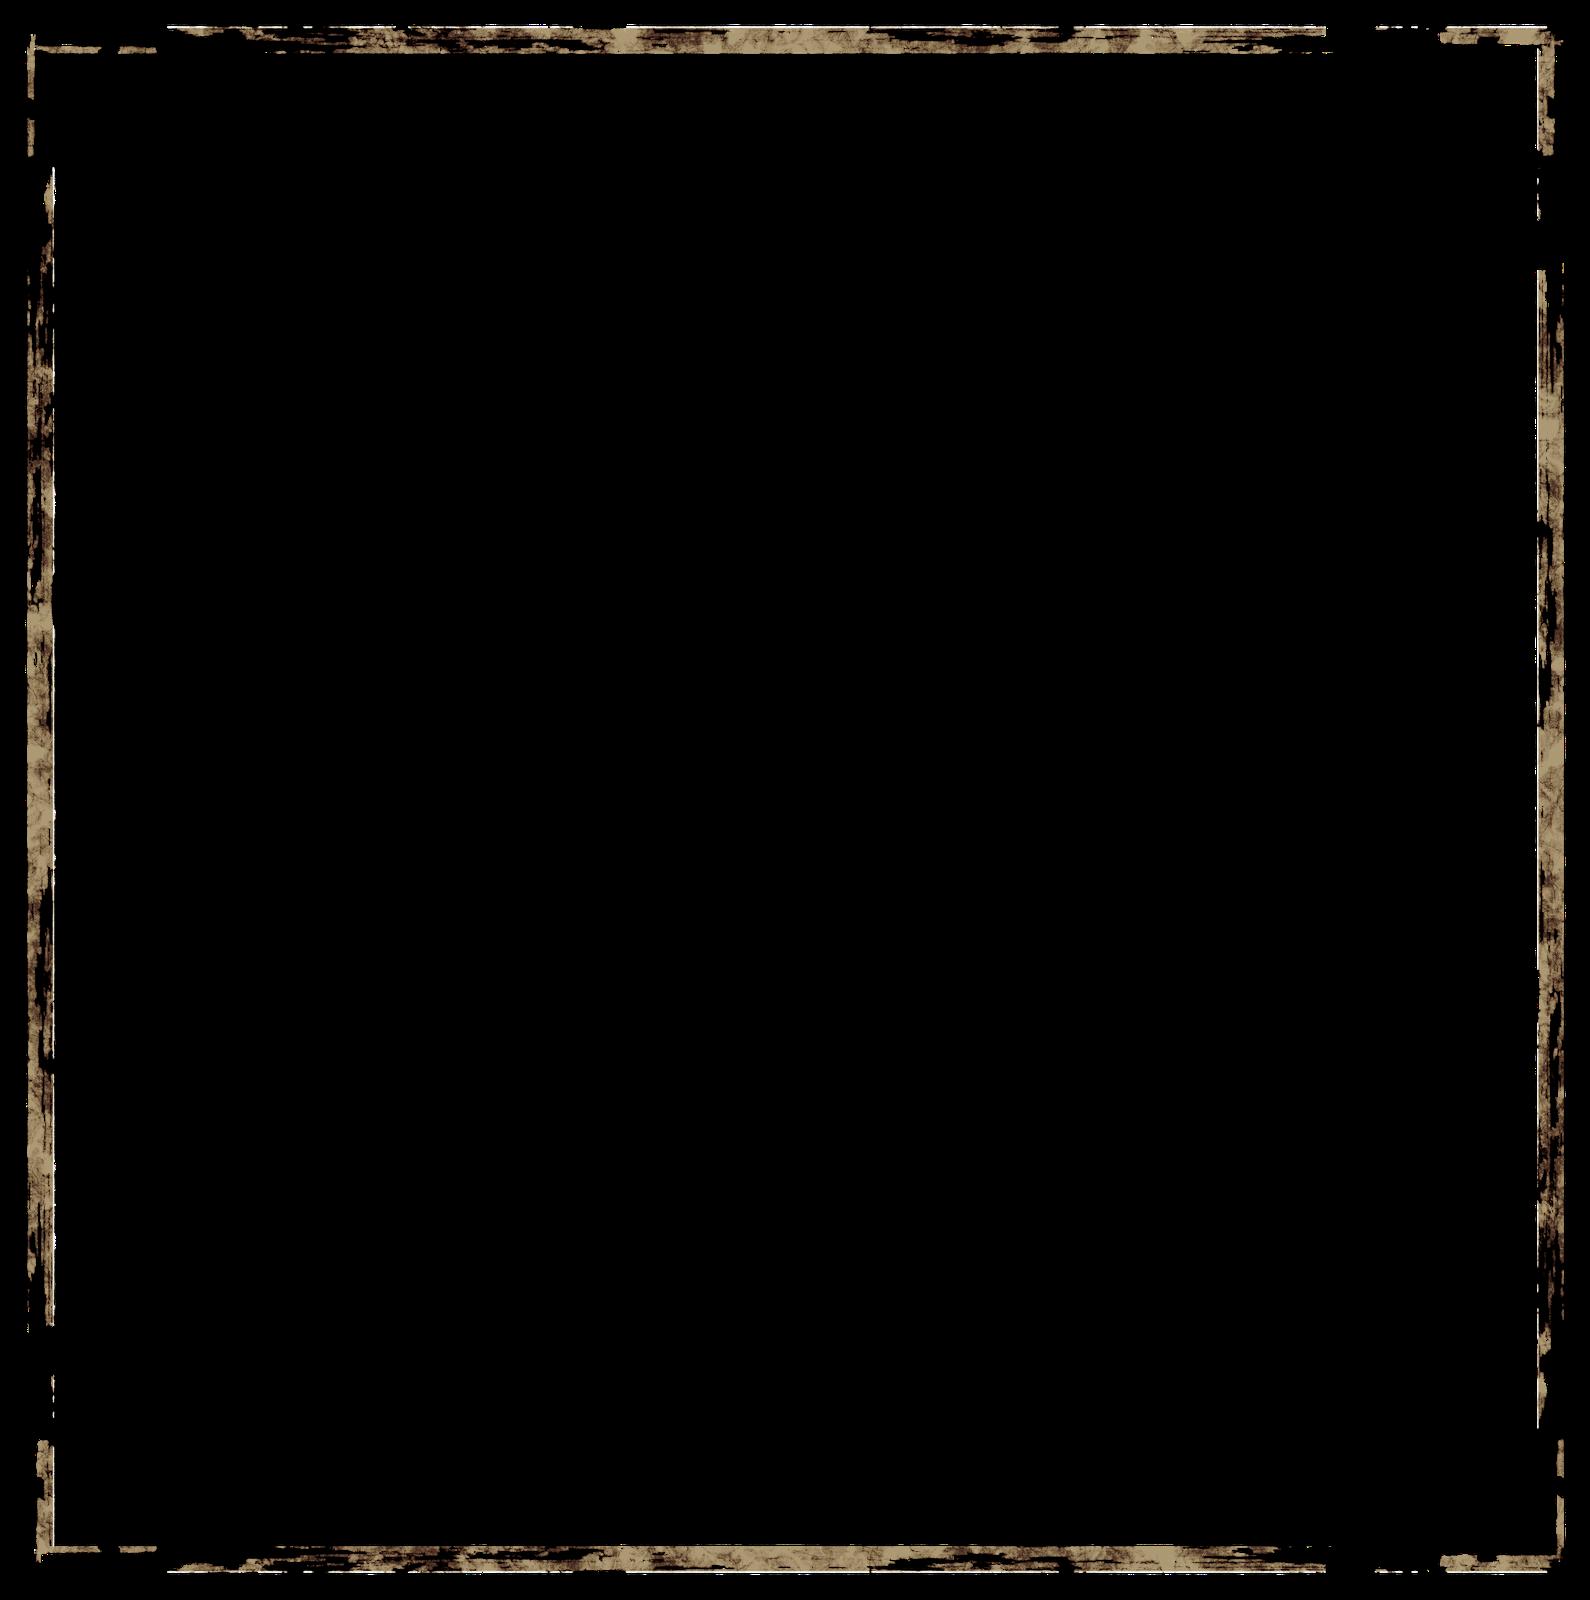 Grunge Border Png - Image Mag